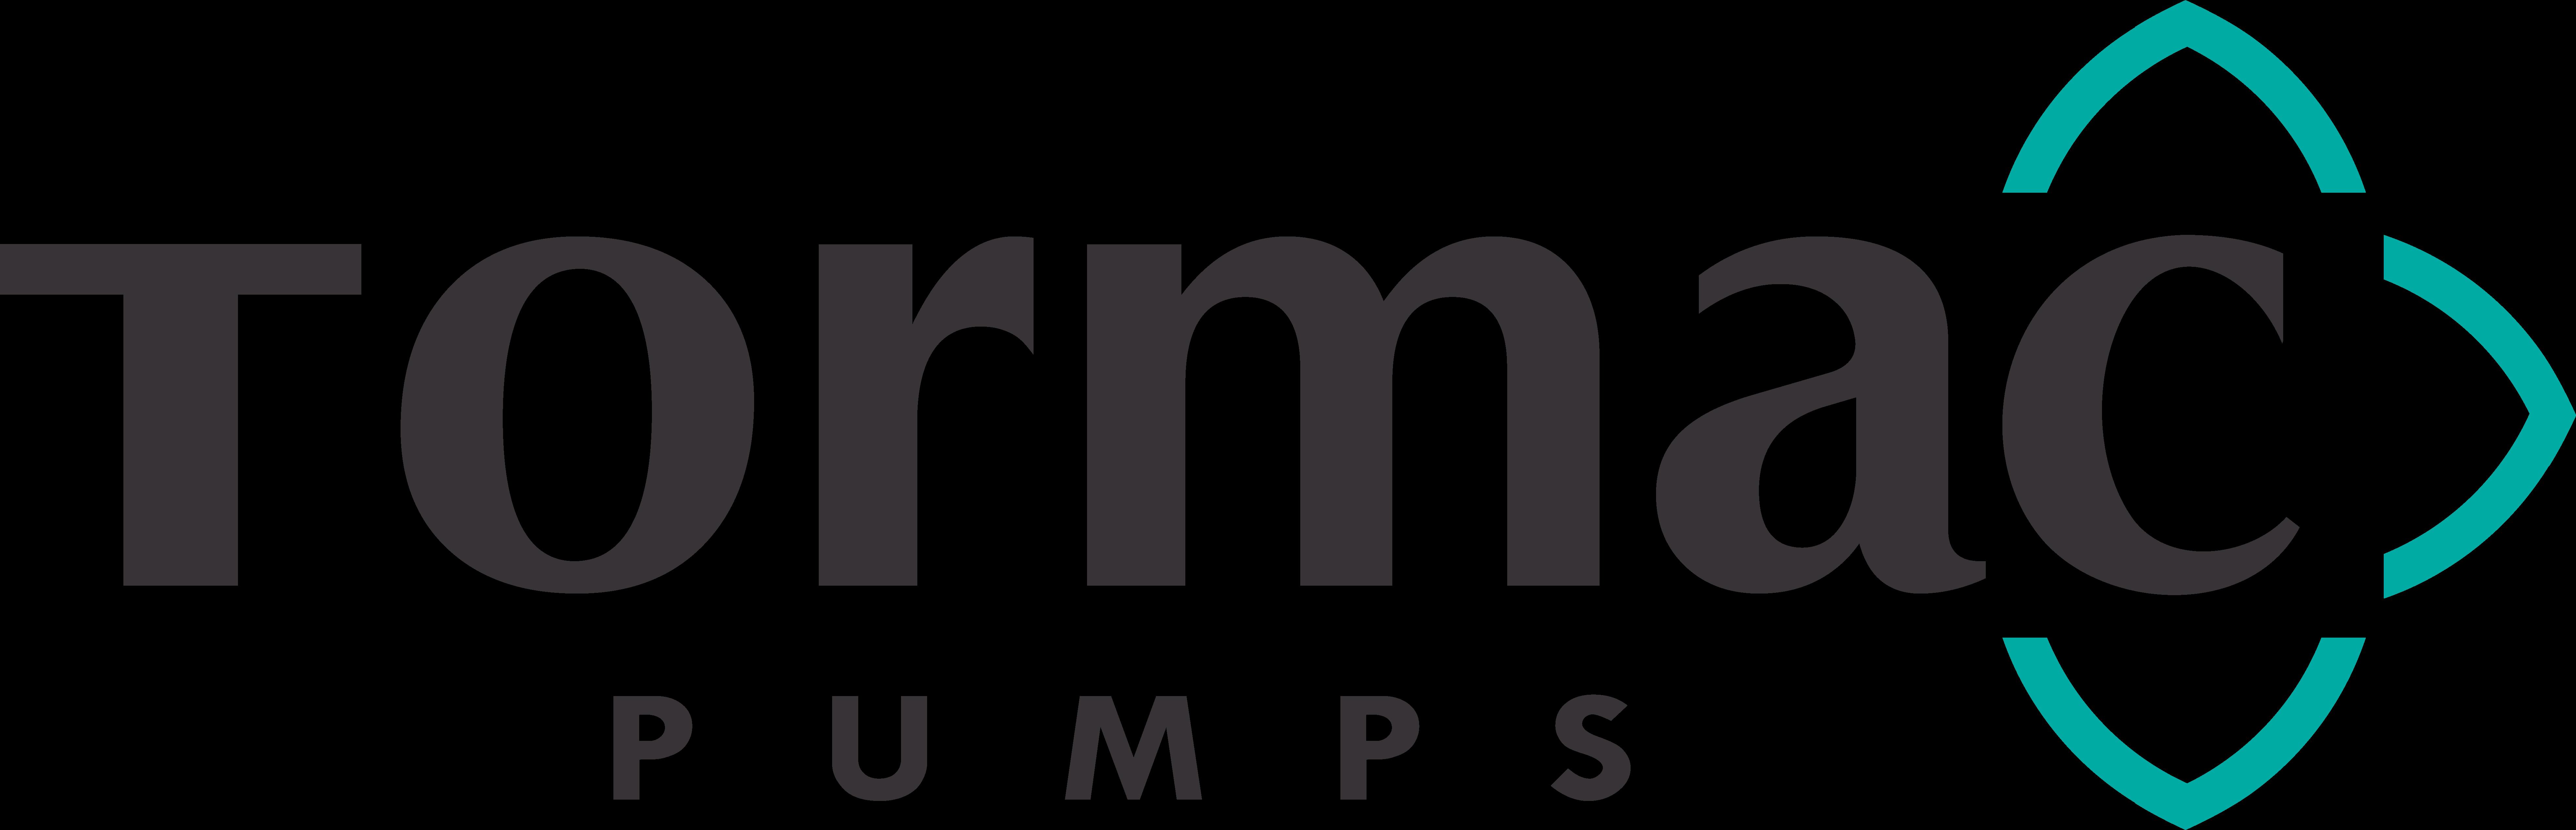 Tormac